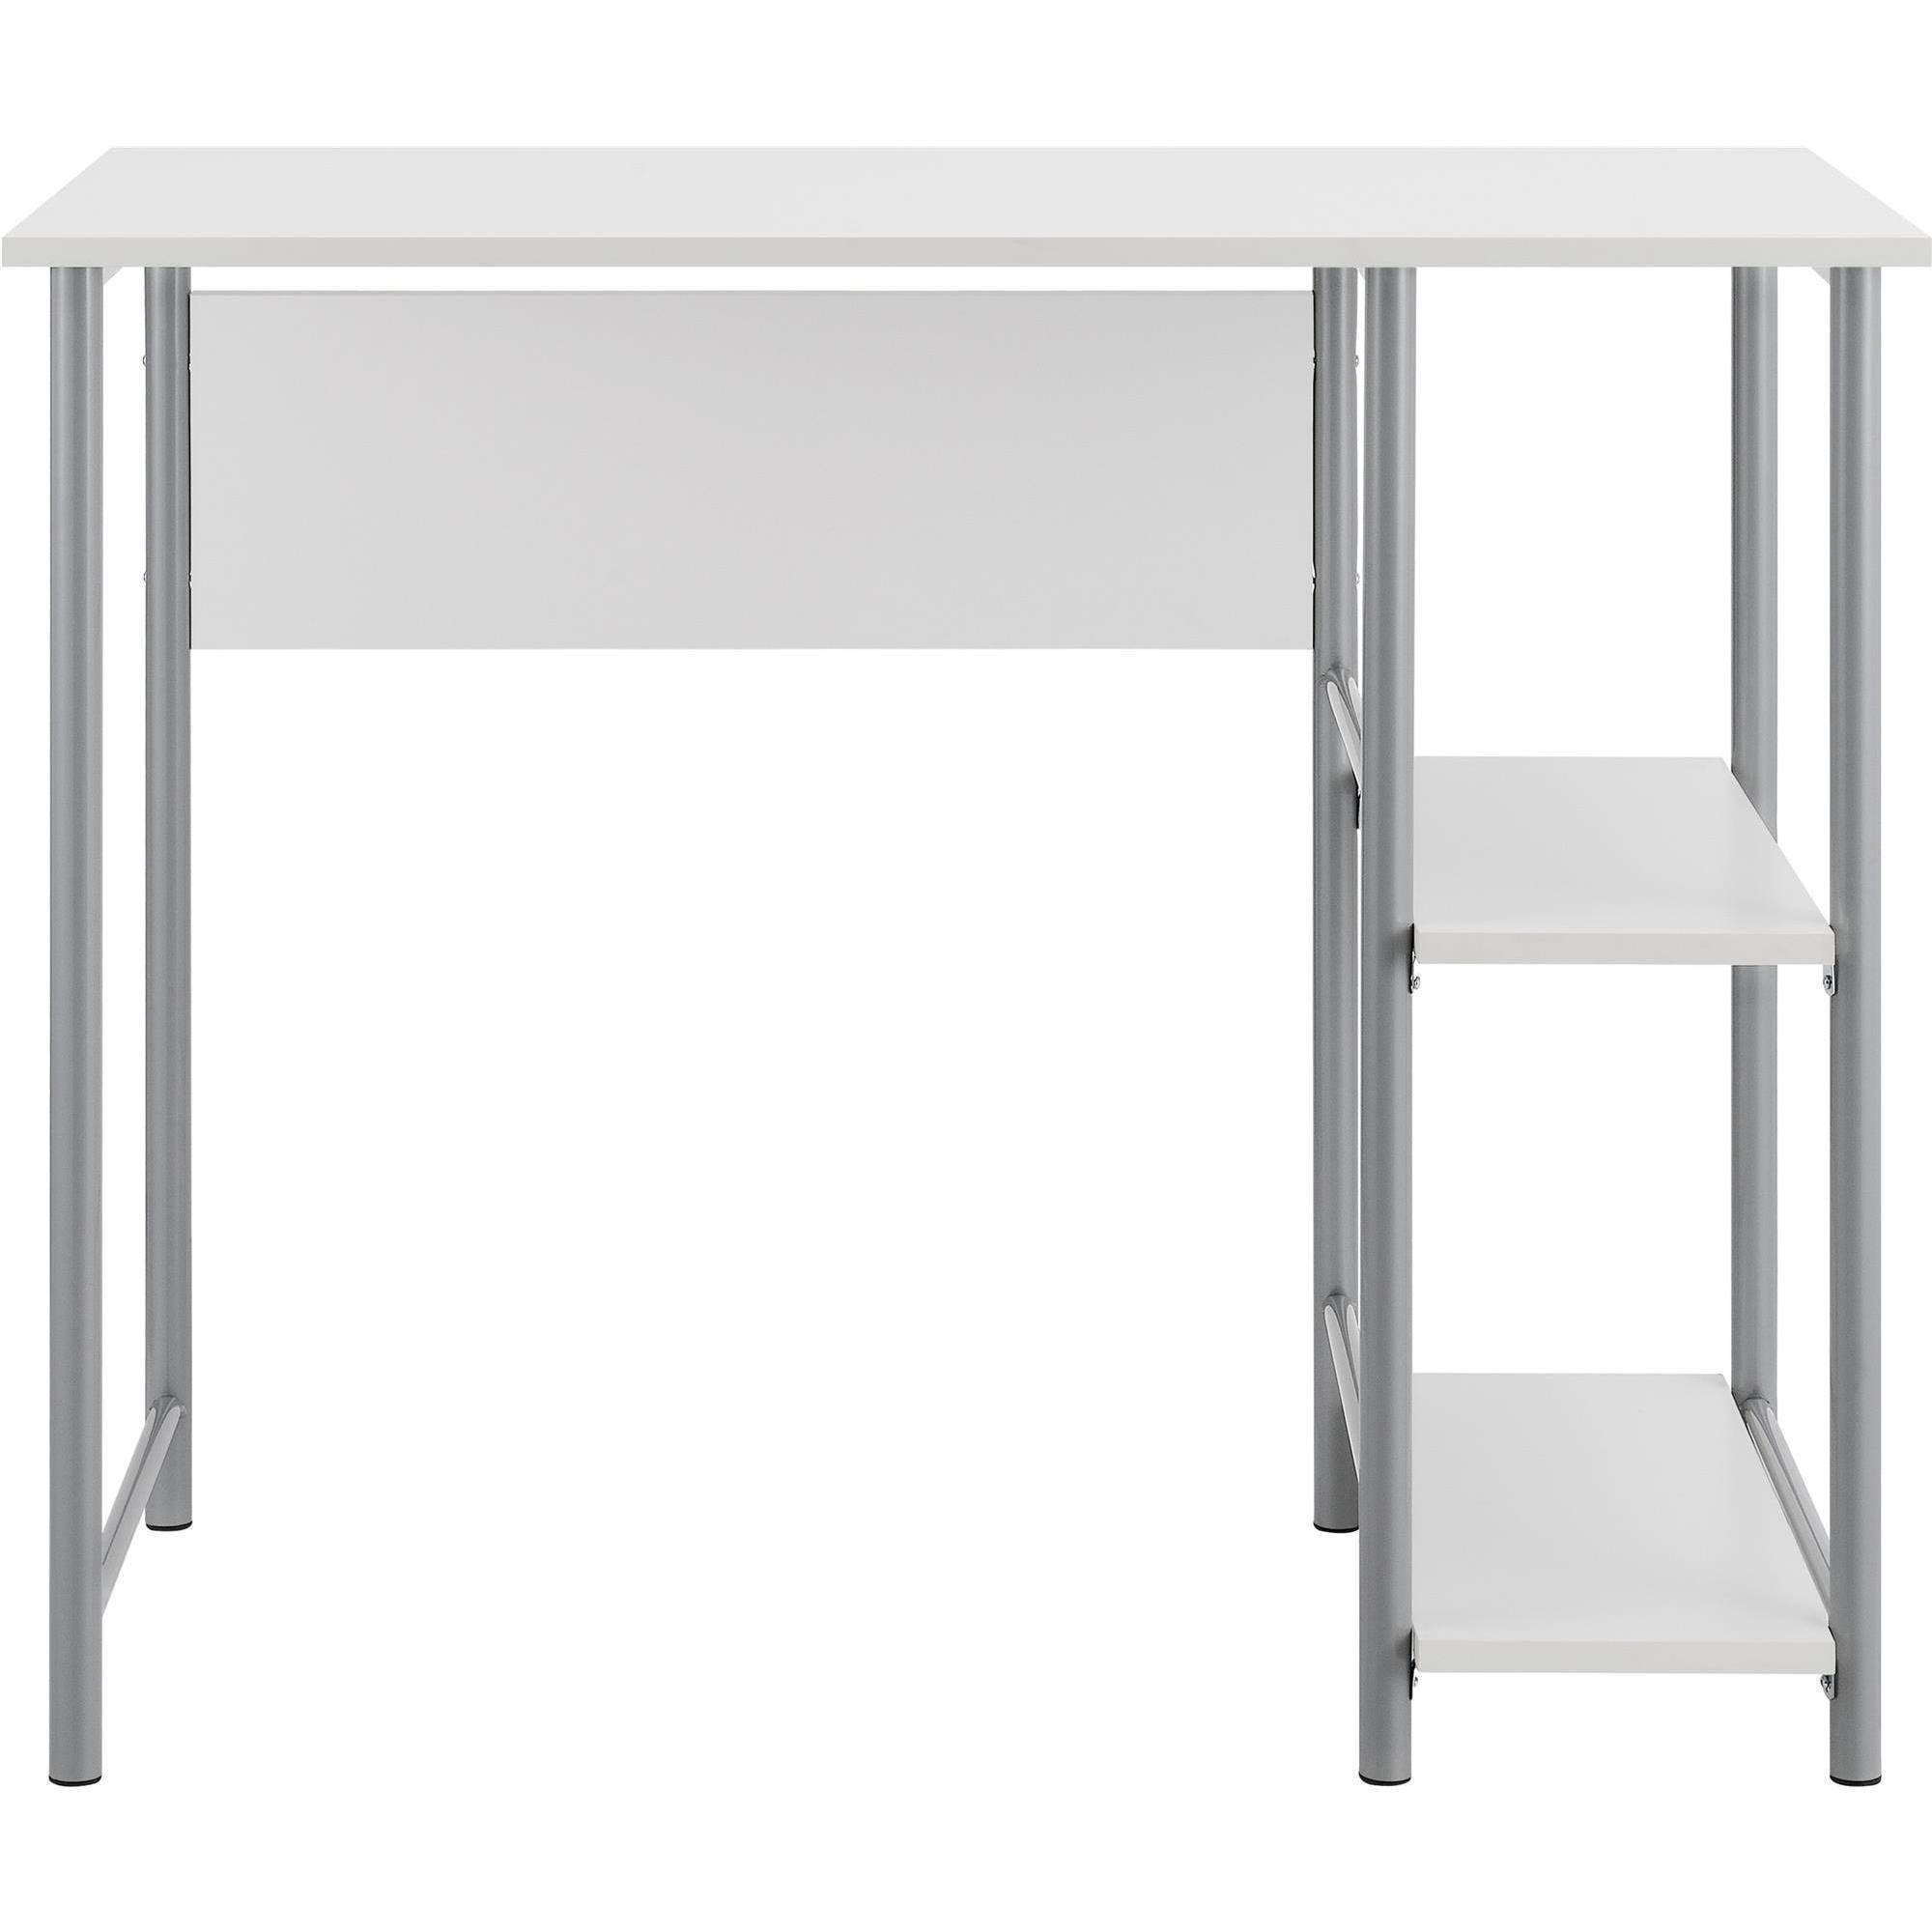 Mainstays Computer Desk Multiple Colors Com Rh Student White Mainstay